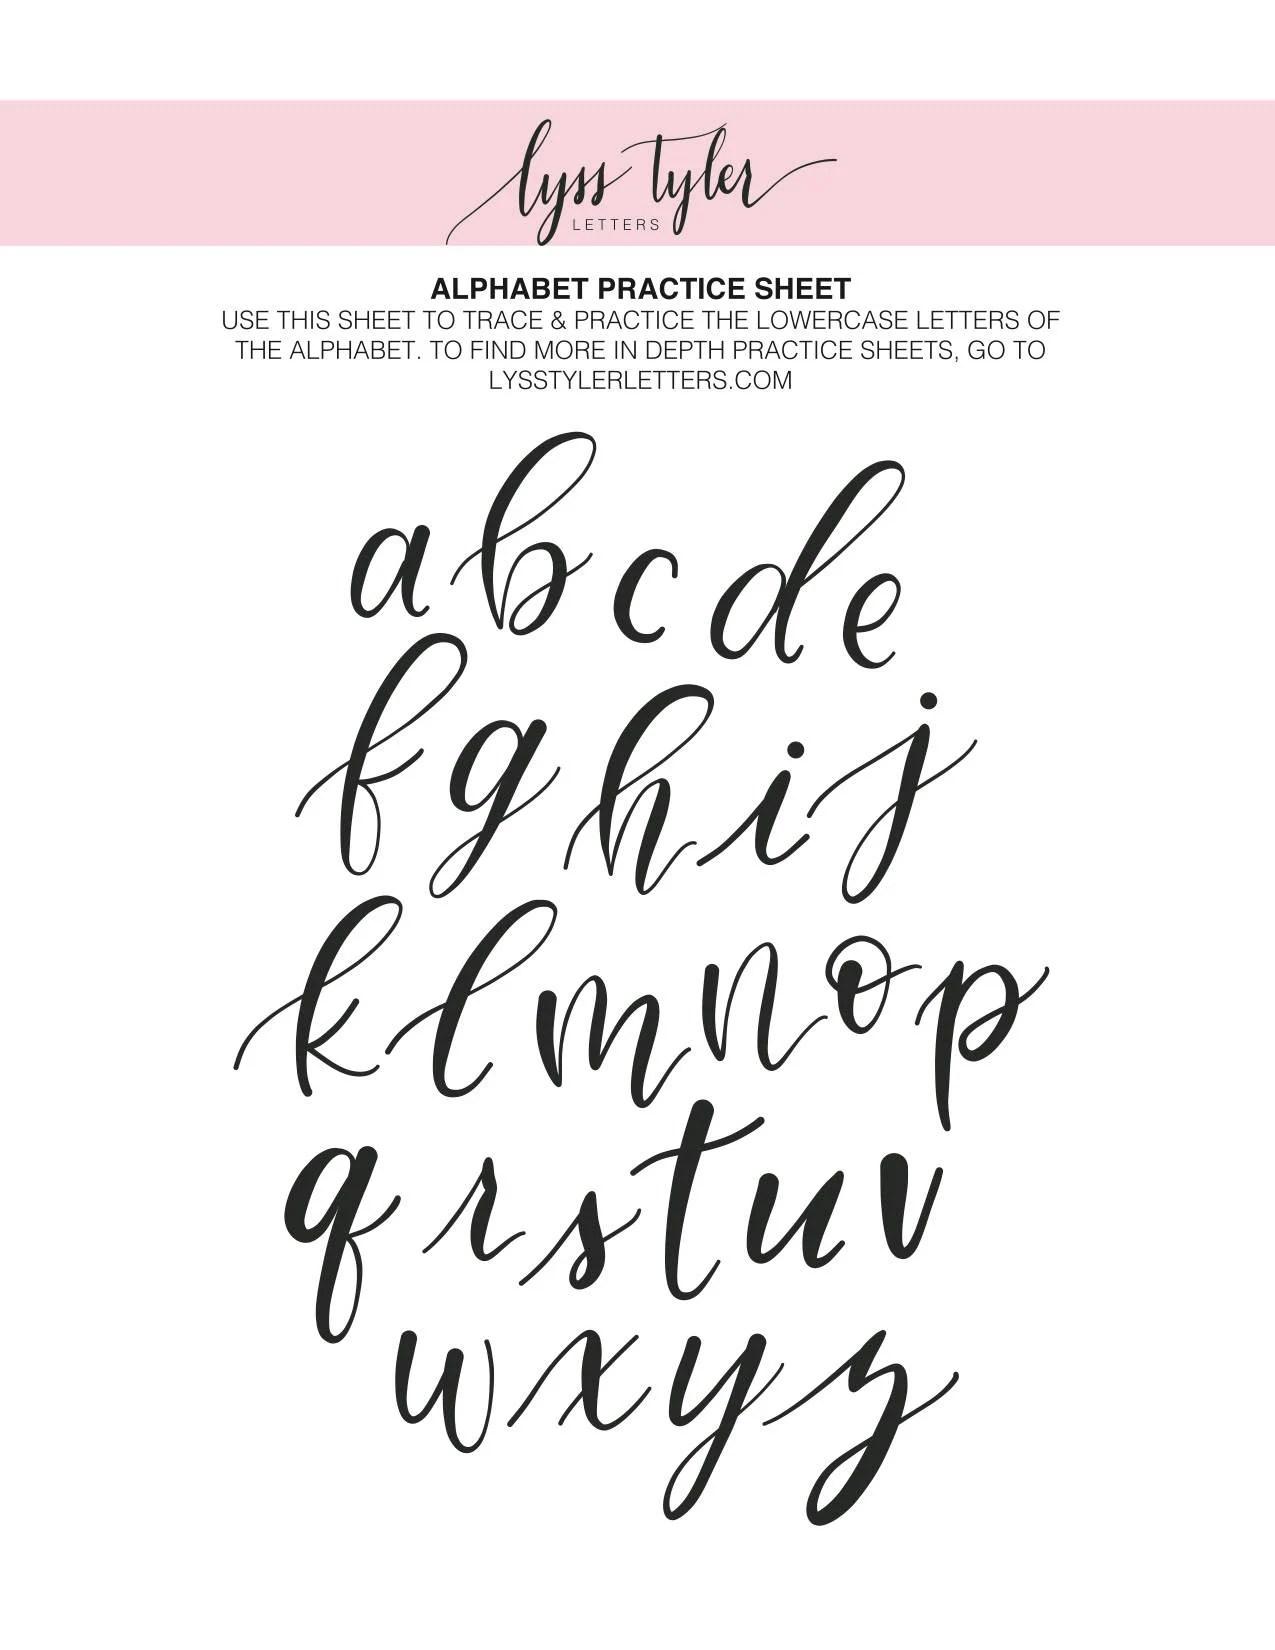 Alphabet Practice Sheets Lowercase Capitals Brush